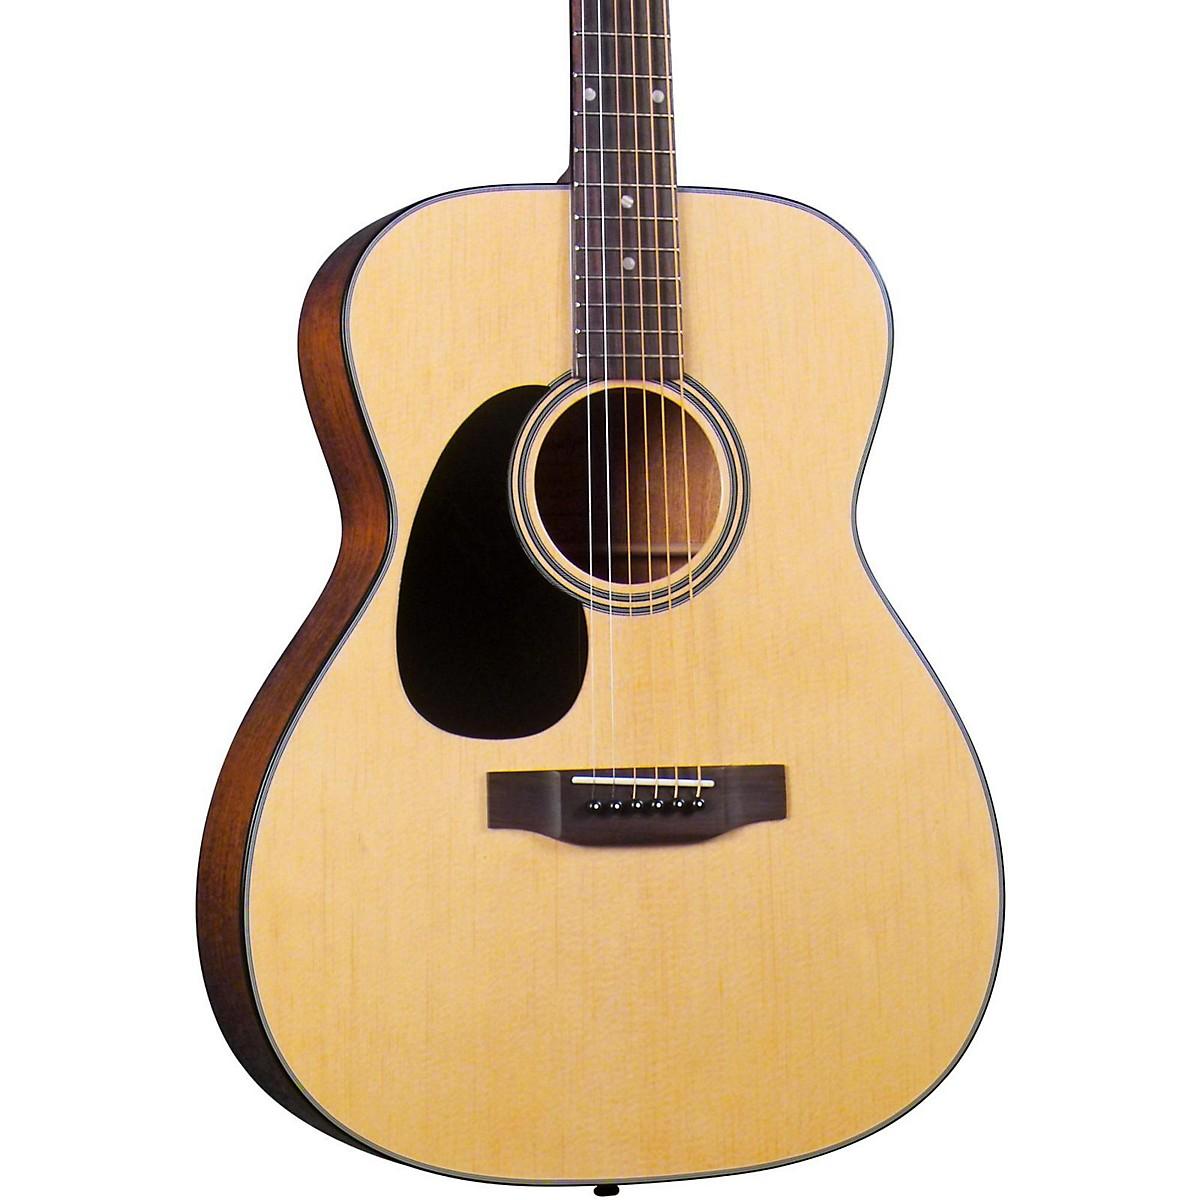 Blueridge Contemporary Series BR-43LH Left-Handed 000 Acoustic Guitar